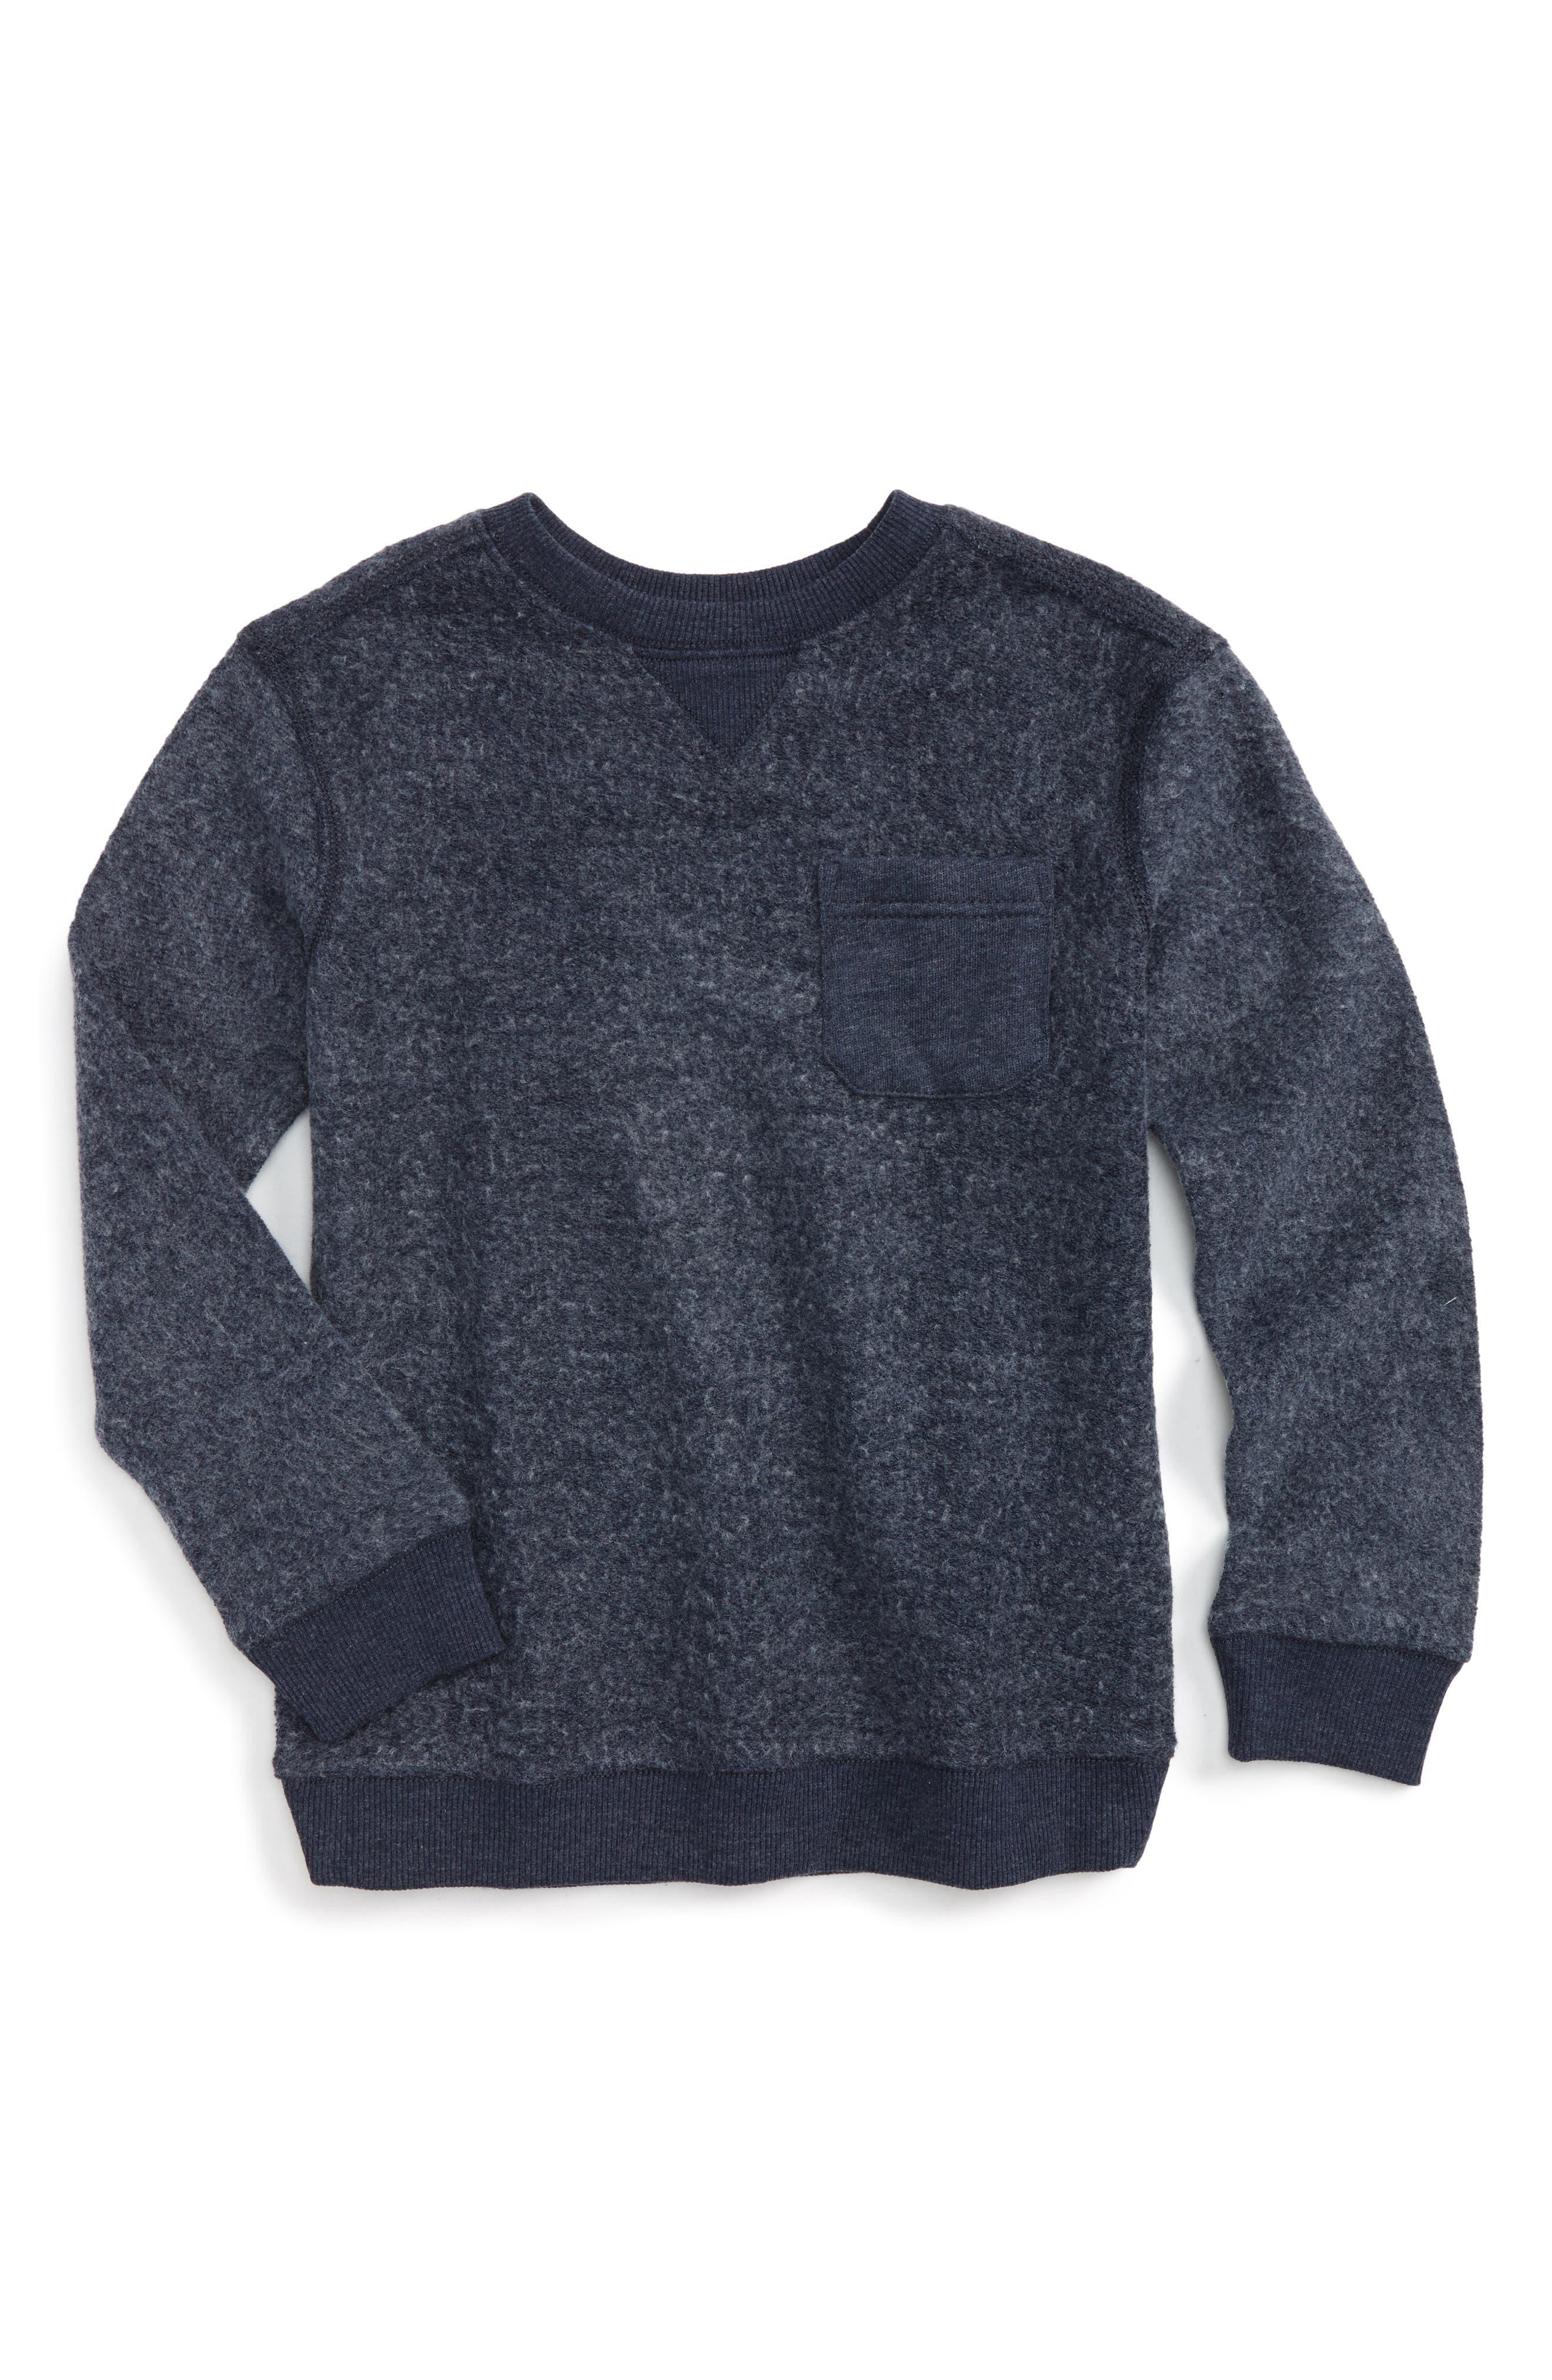 Fleece Sweatshirt,                         Main,                         color,